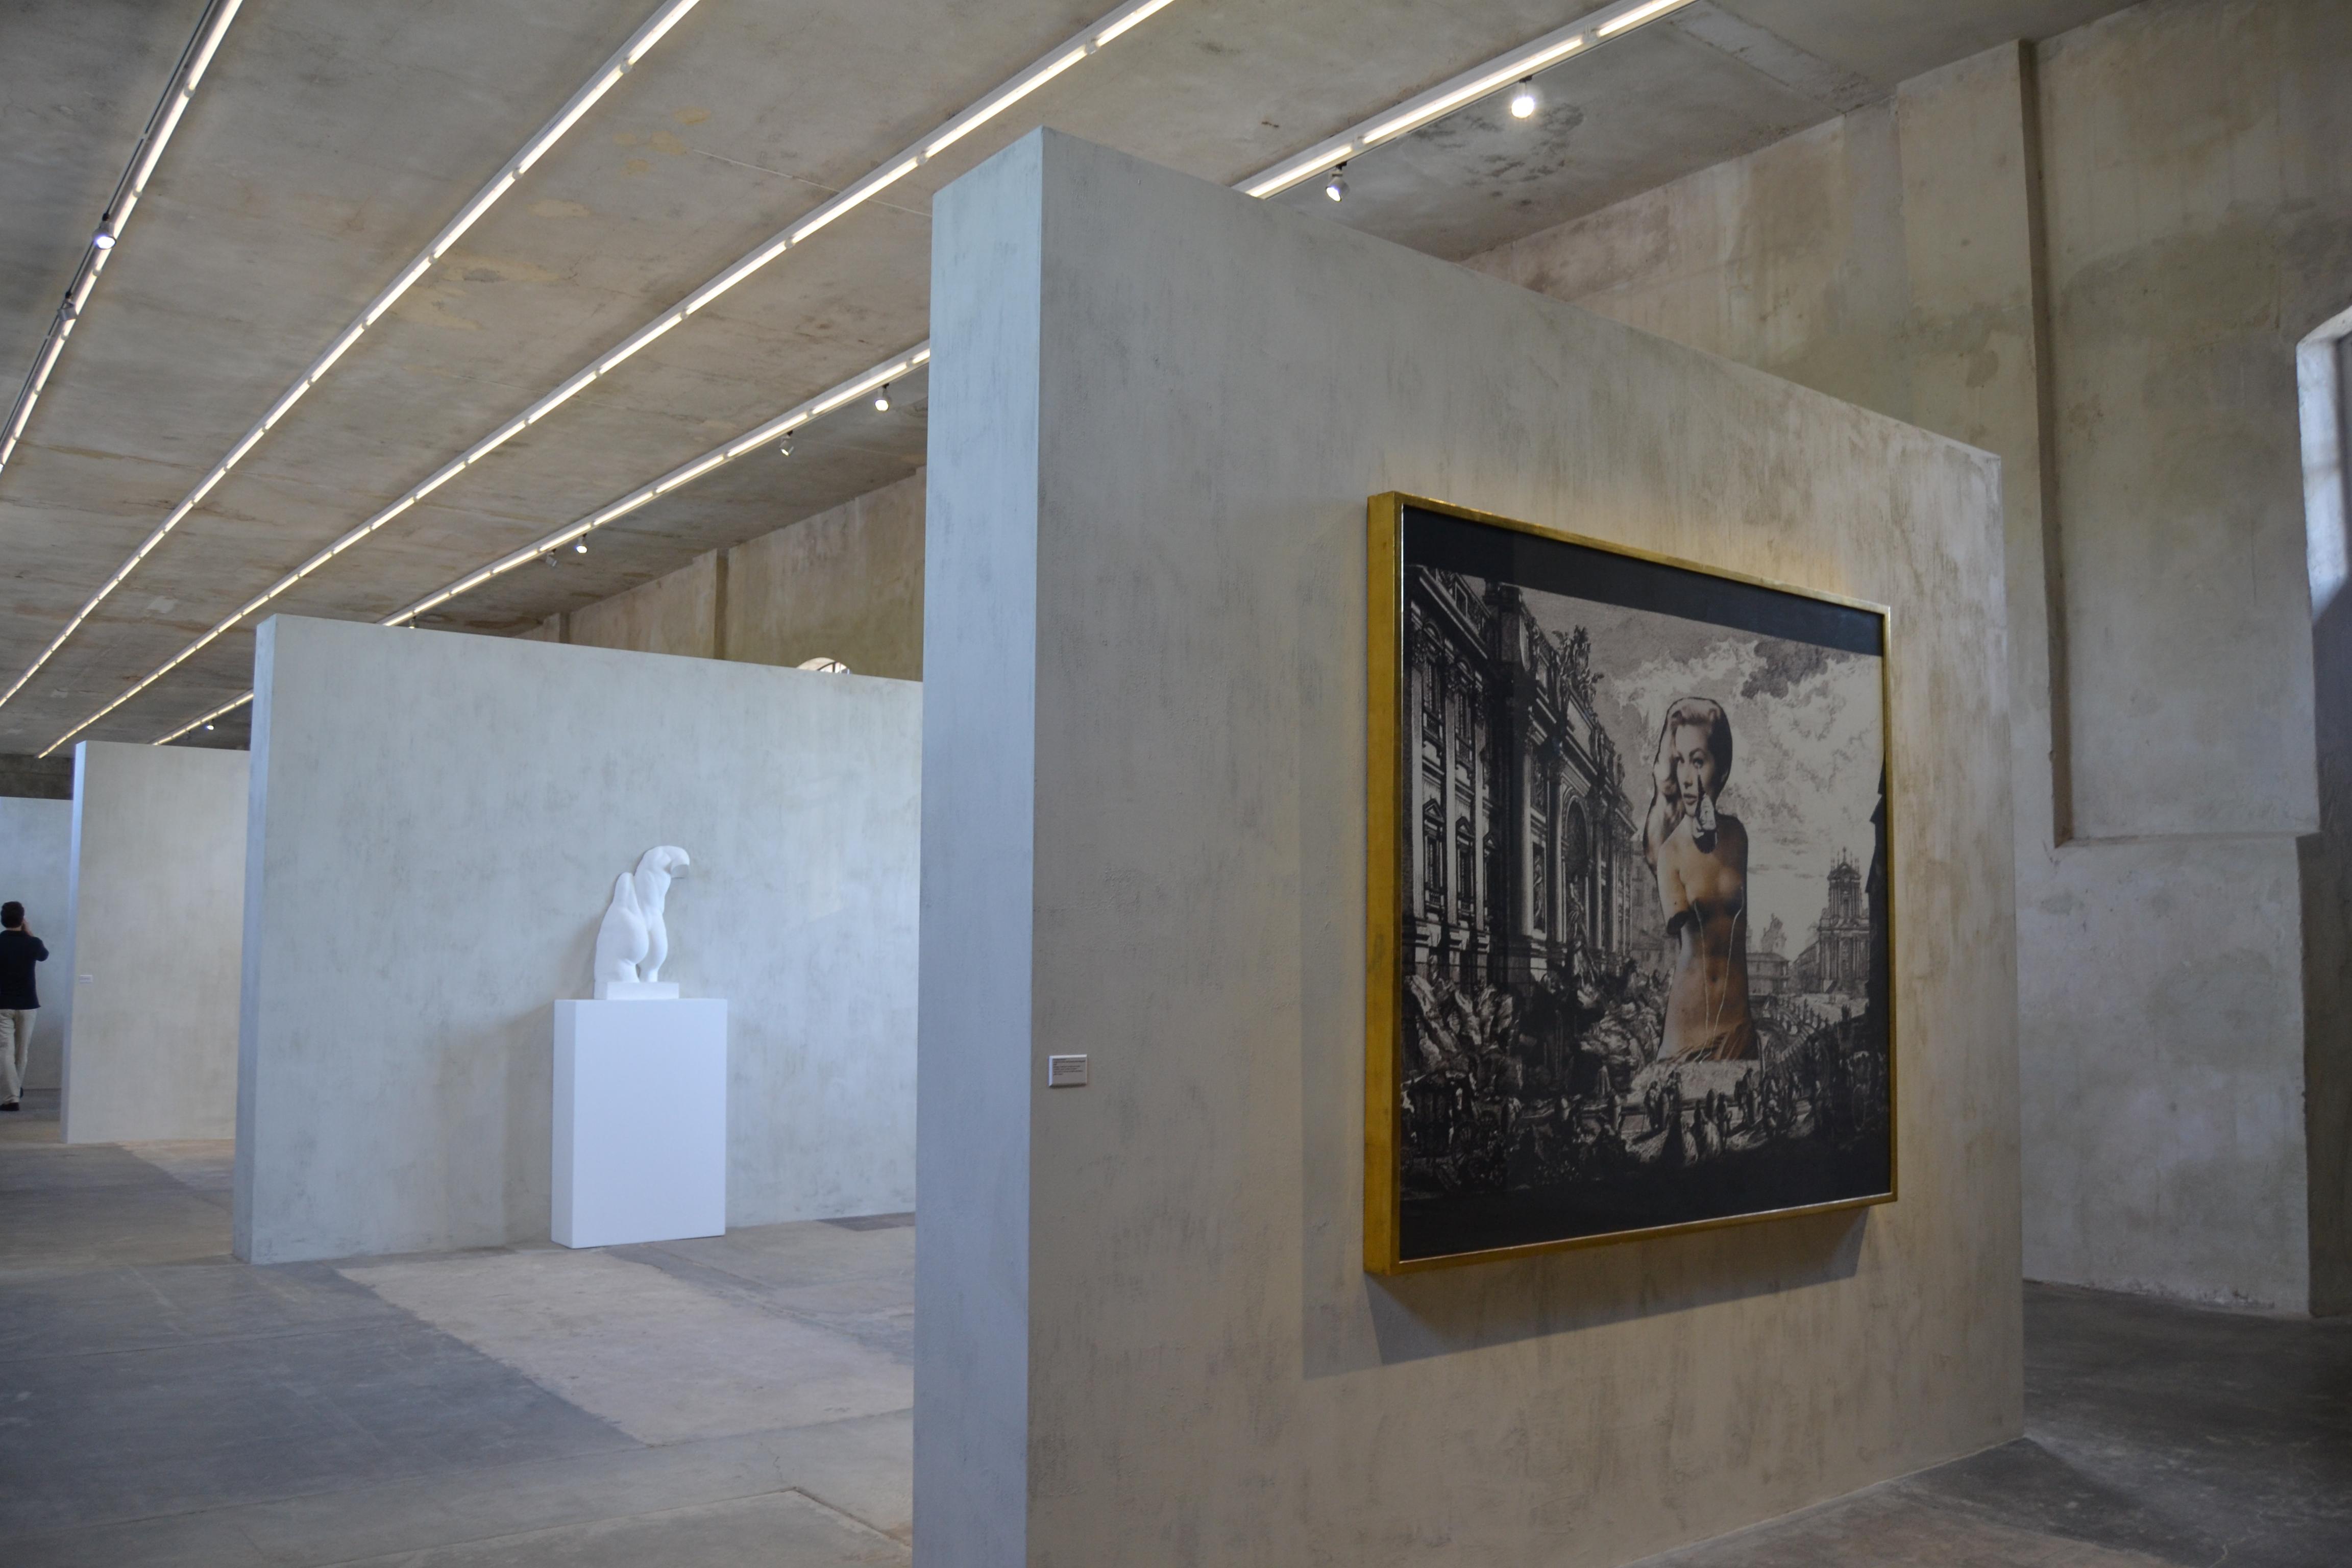 Fondazione Prada- In part (nord).